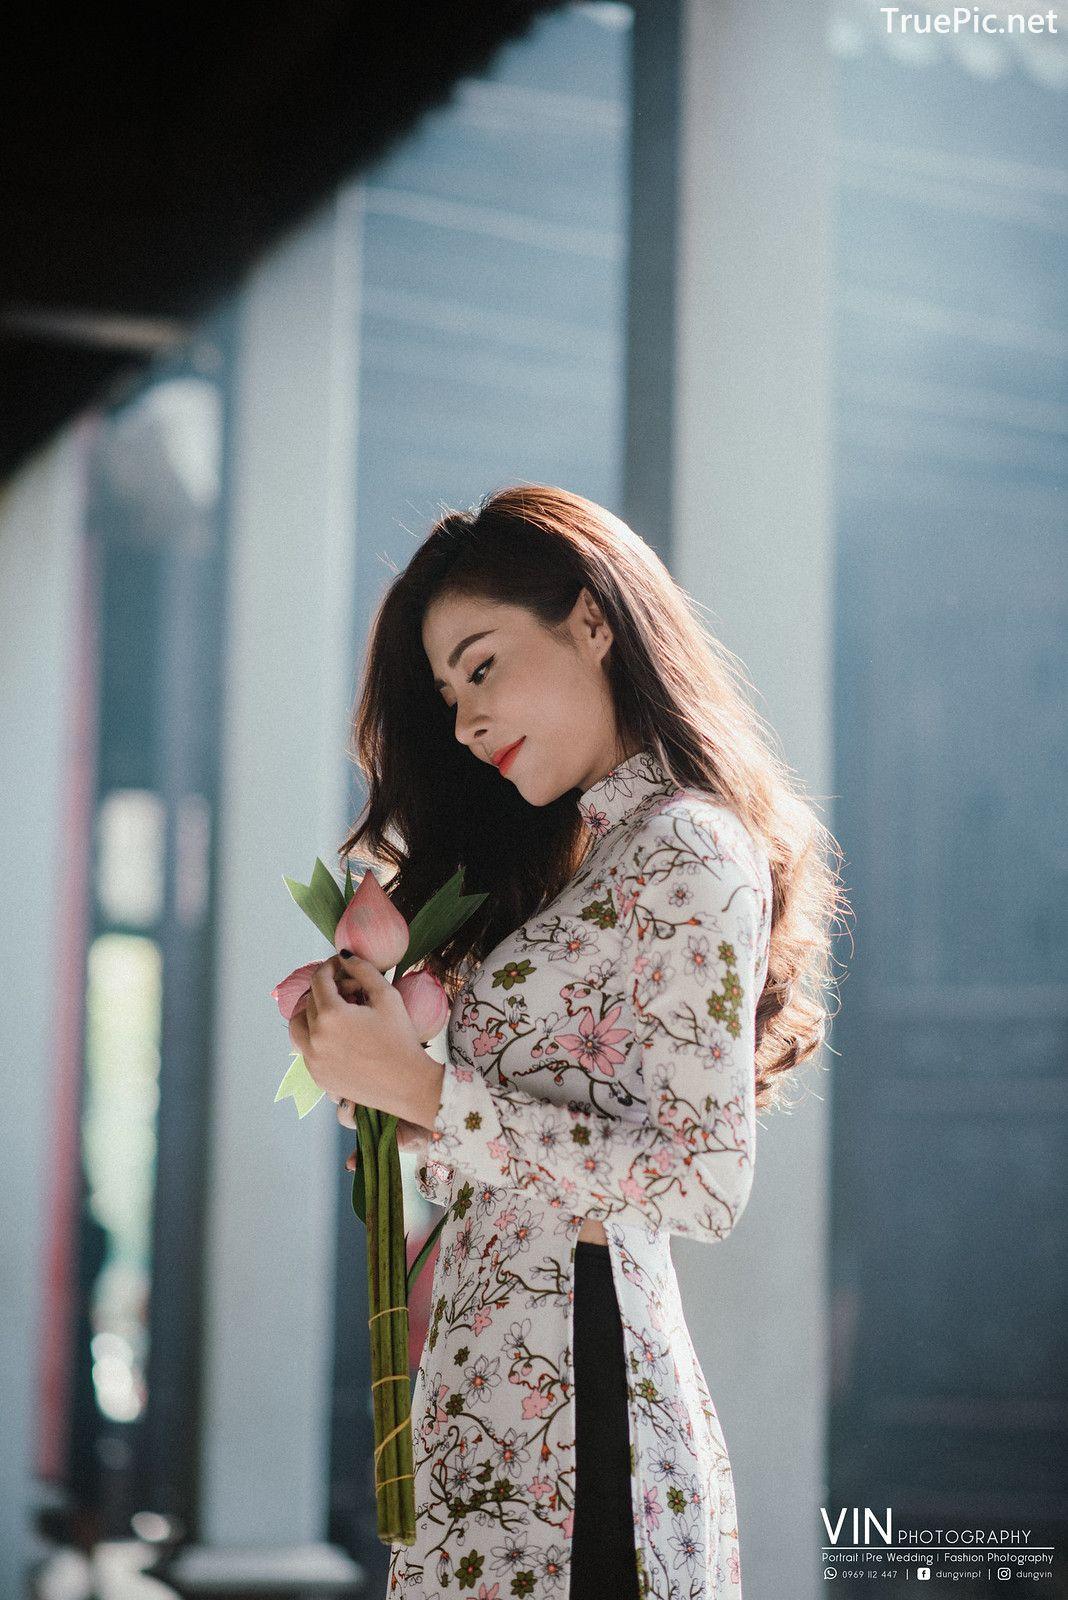 Image-Vietnamese-Beautiful-Girl-Ao-Dai-Vietnam-Traditional-Dress-by-VIN-Photo-3-TruePic.net- Picture-2